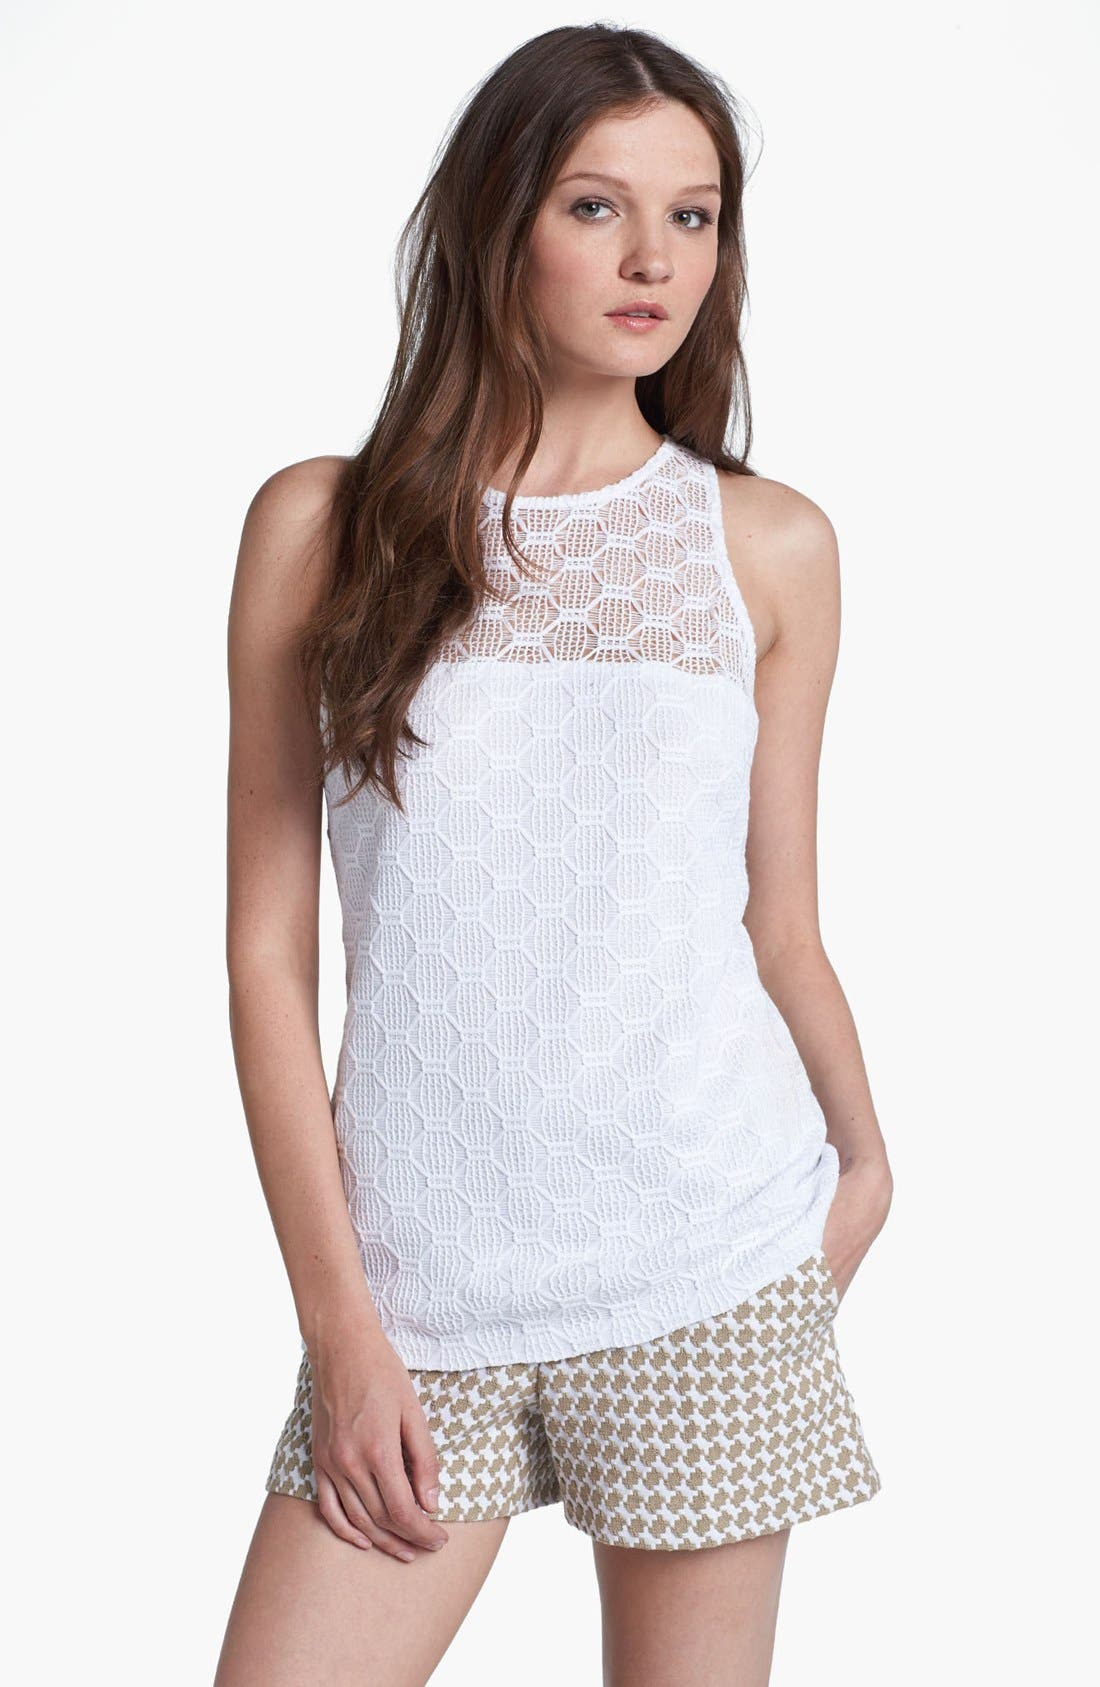 Main Image - Trina Turk 'Deanna' Hexagon Open Lace Top